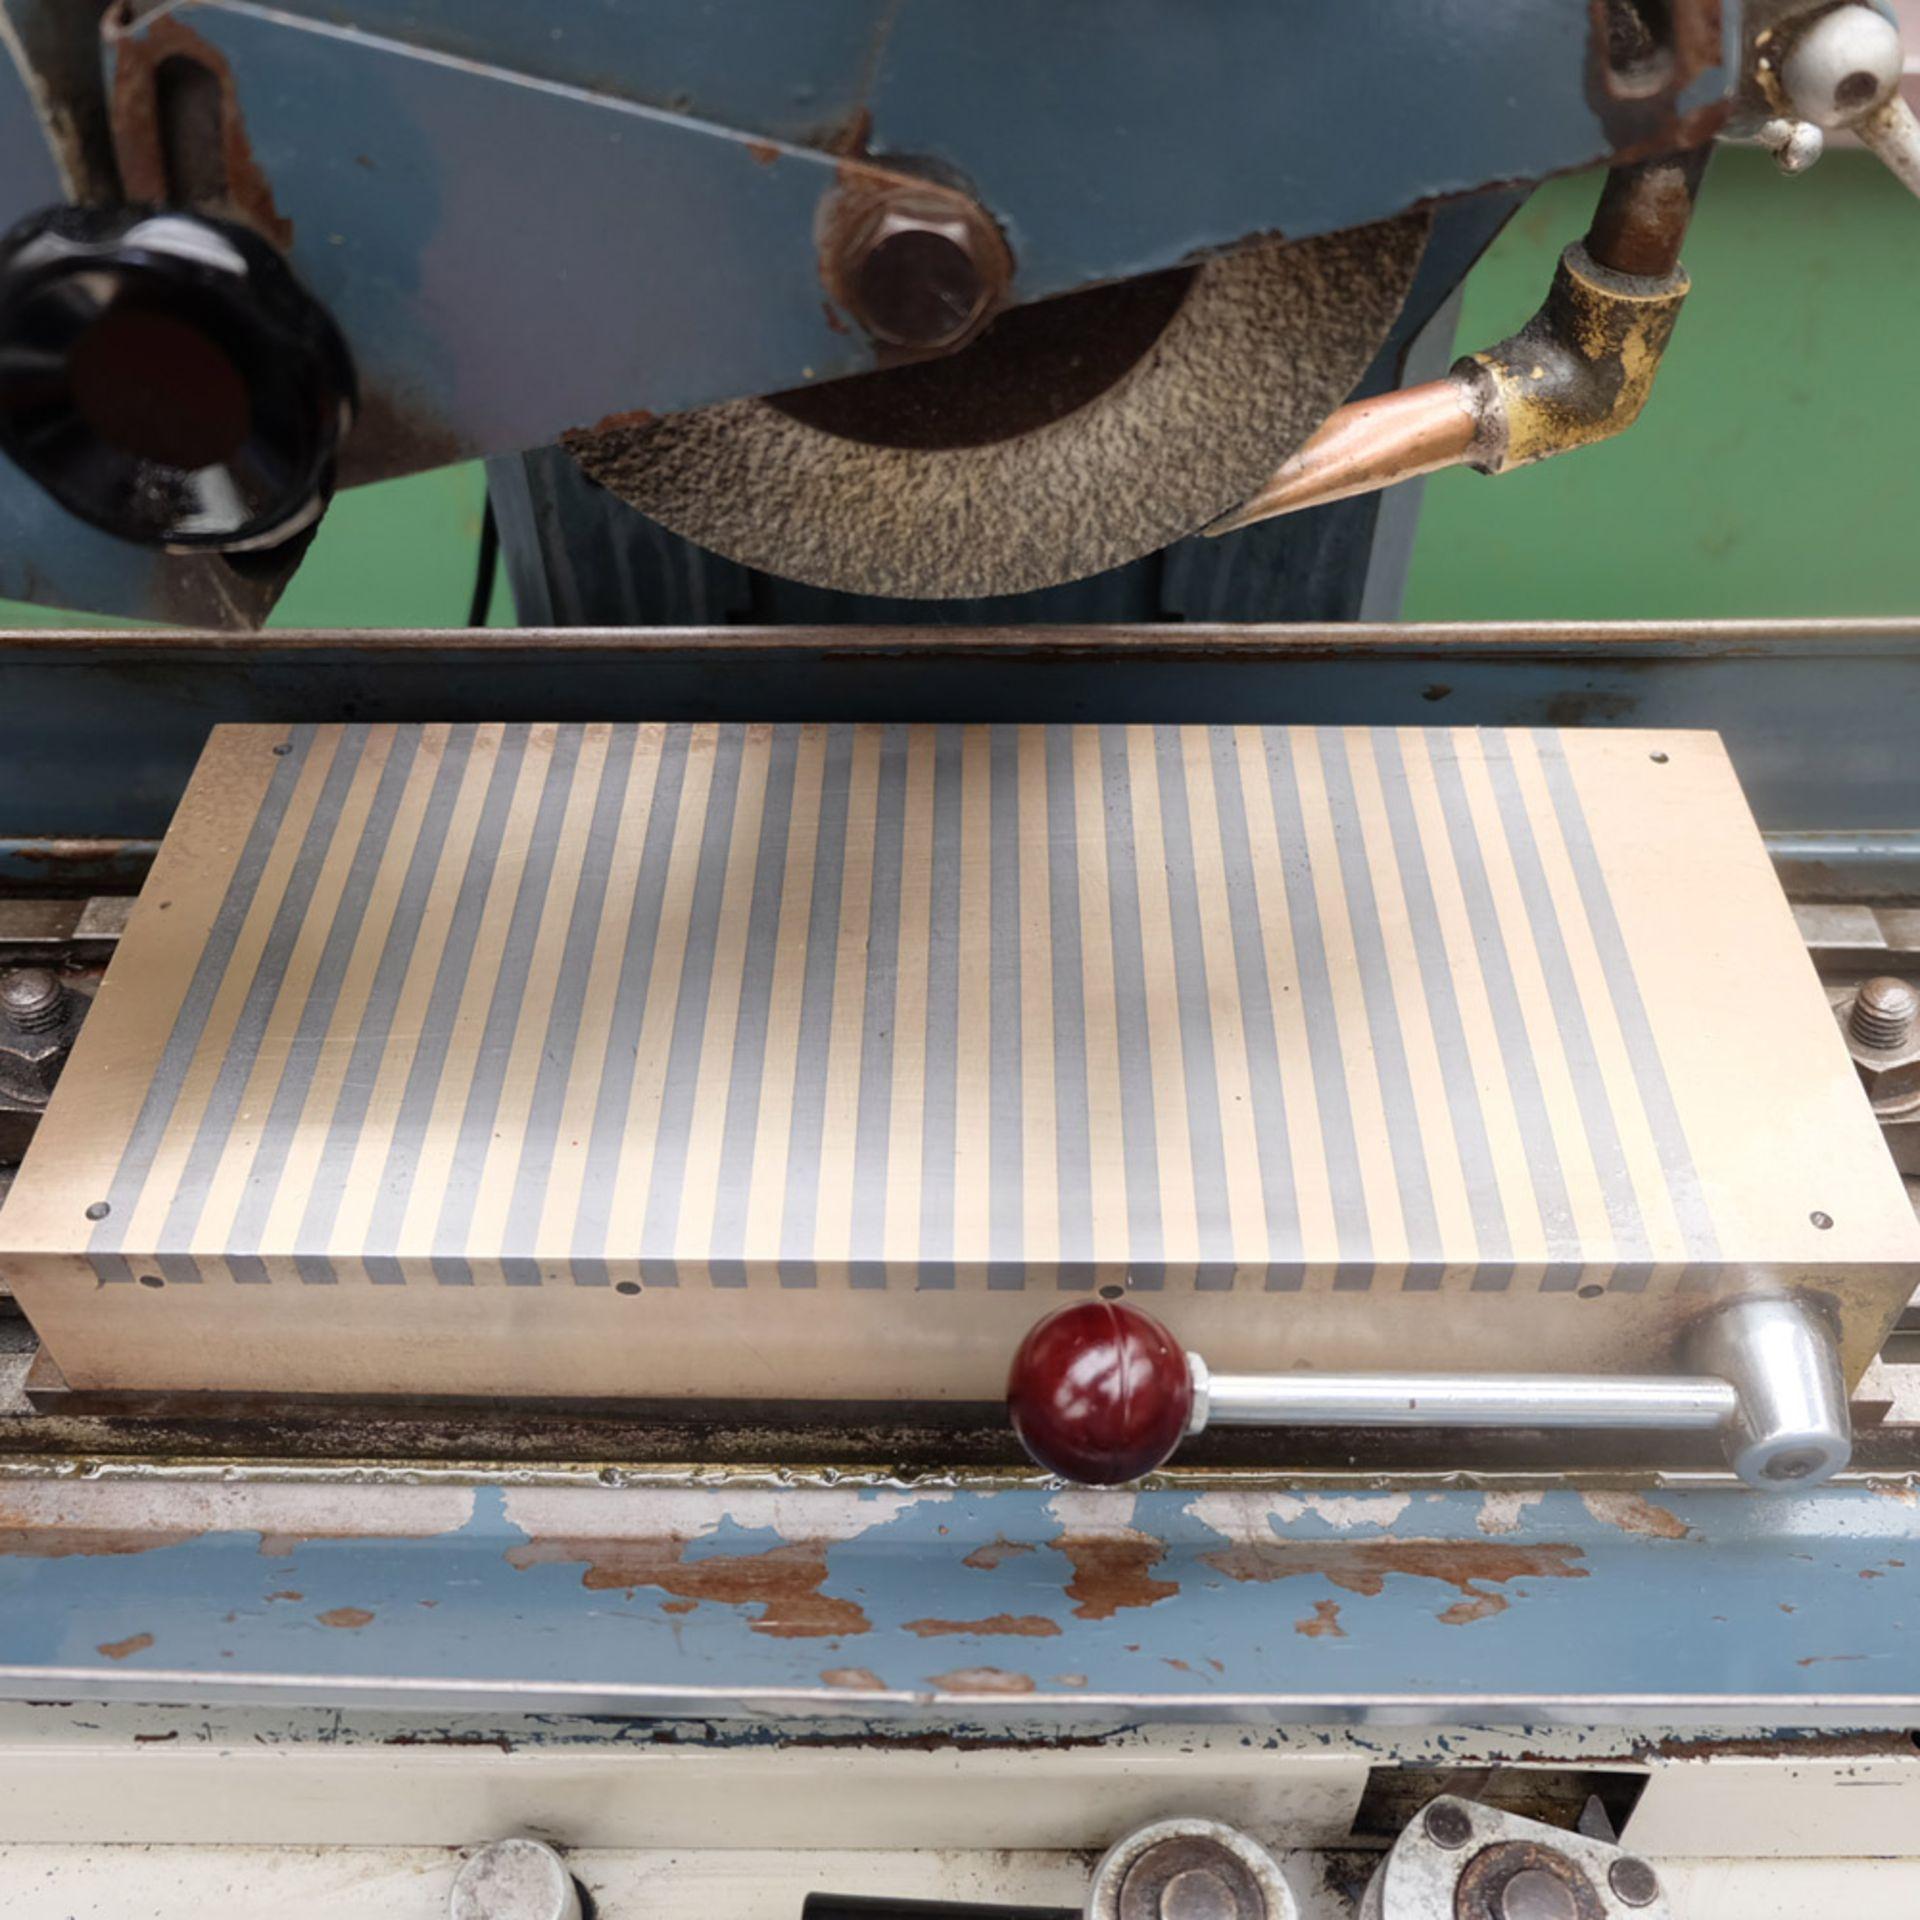 Jones & Shipman 540P Toolroom Surface Grinder. - Image 2 of 7